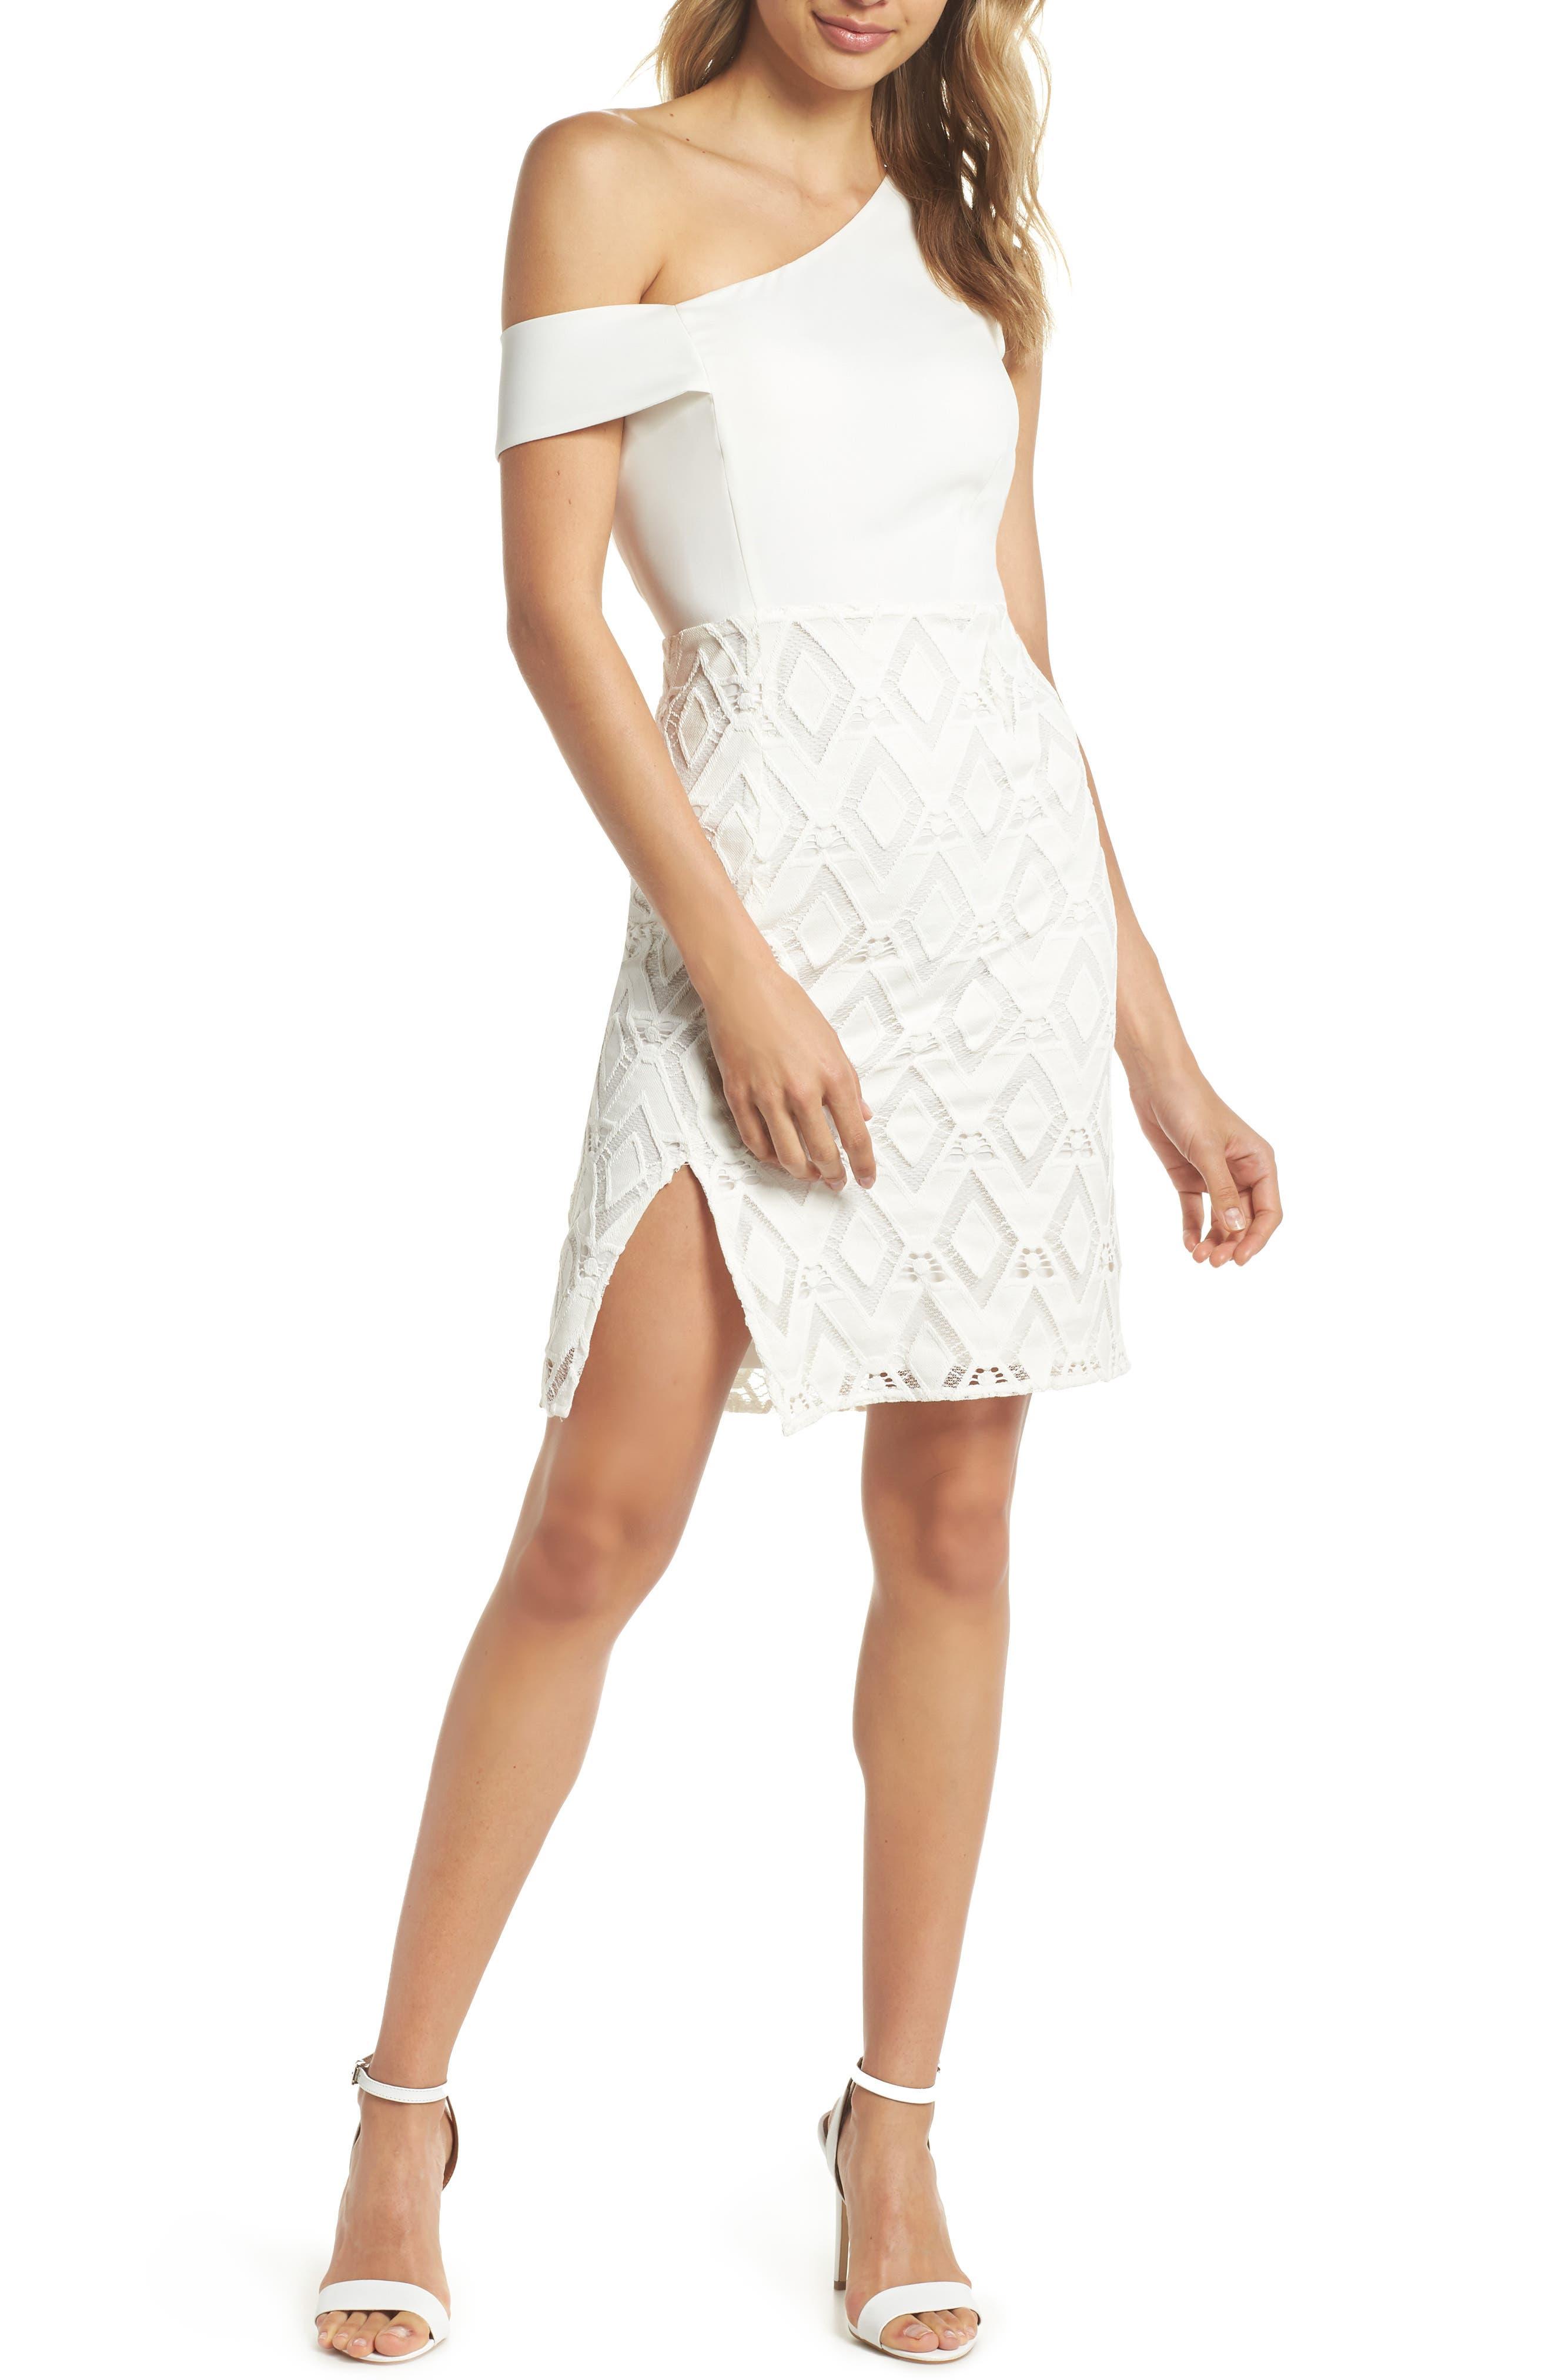 NSR One-Shoulder Lace Sheath Dress